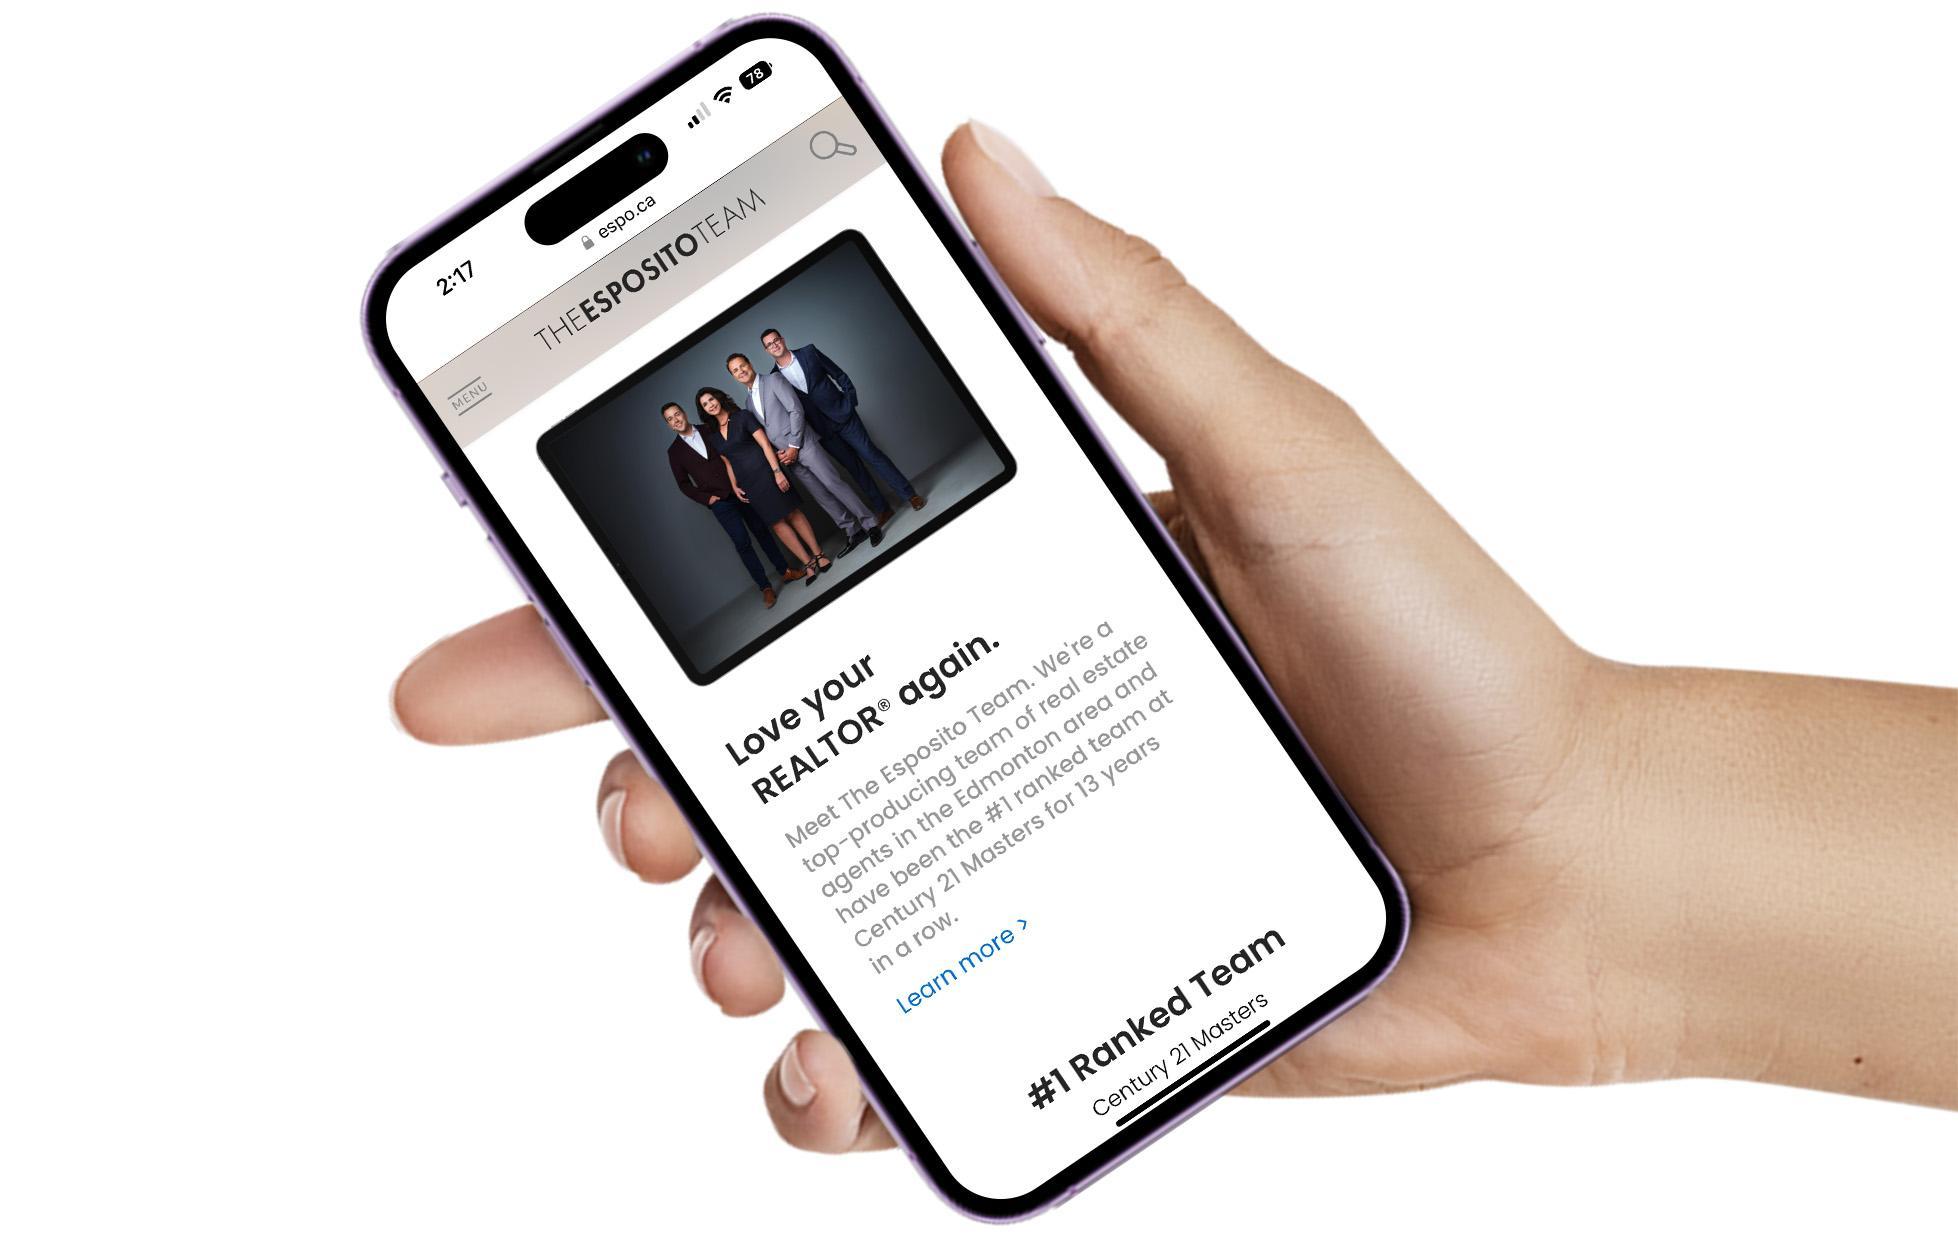 Edmonton local area map on googlemaps.com